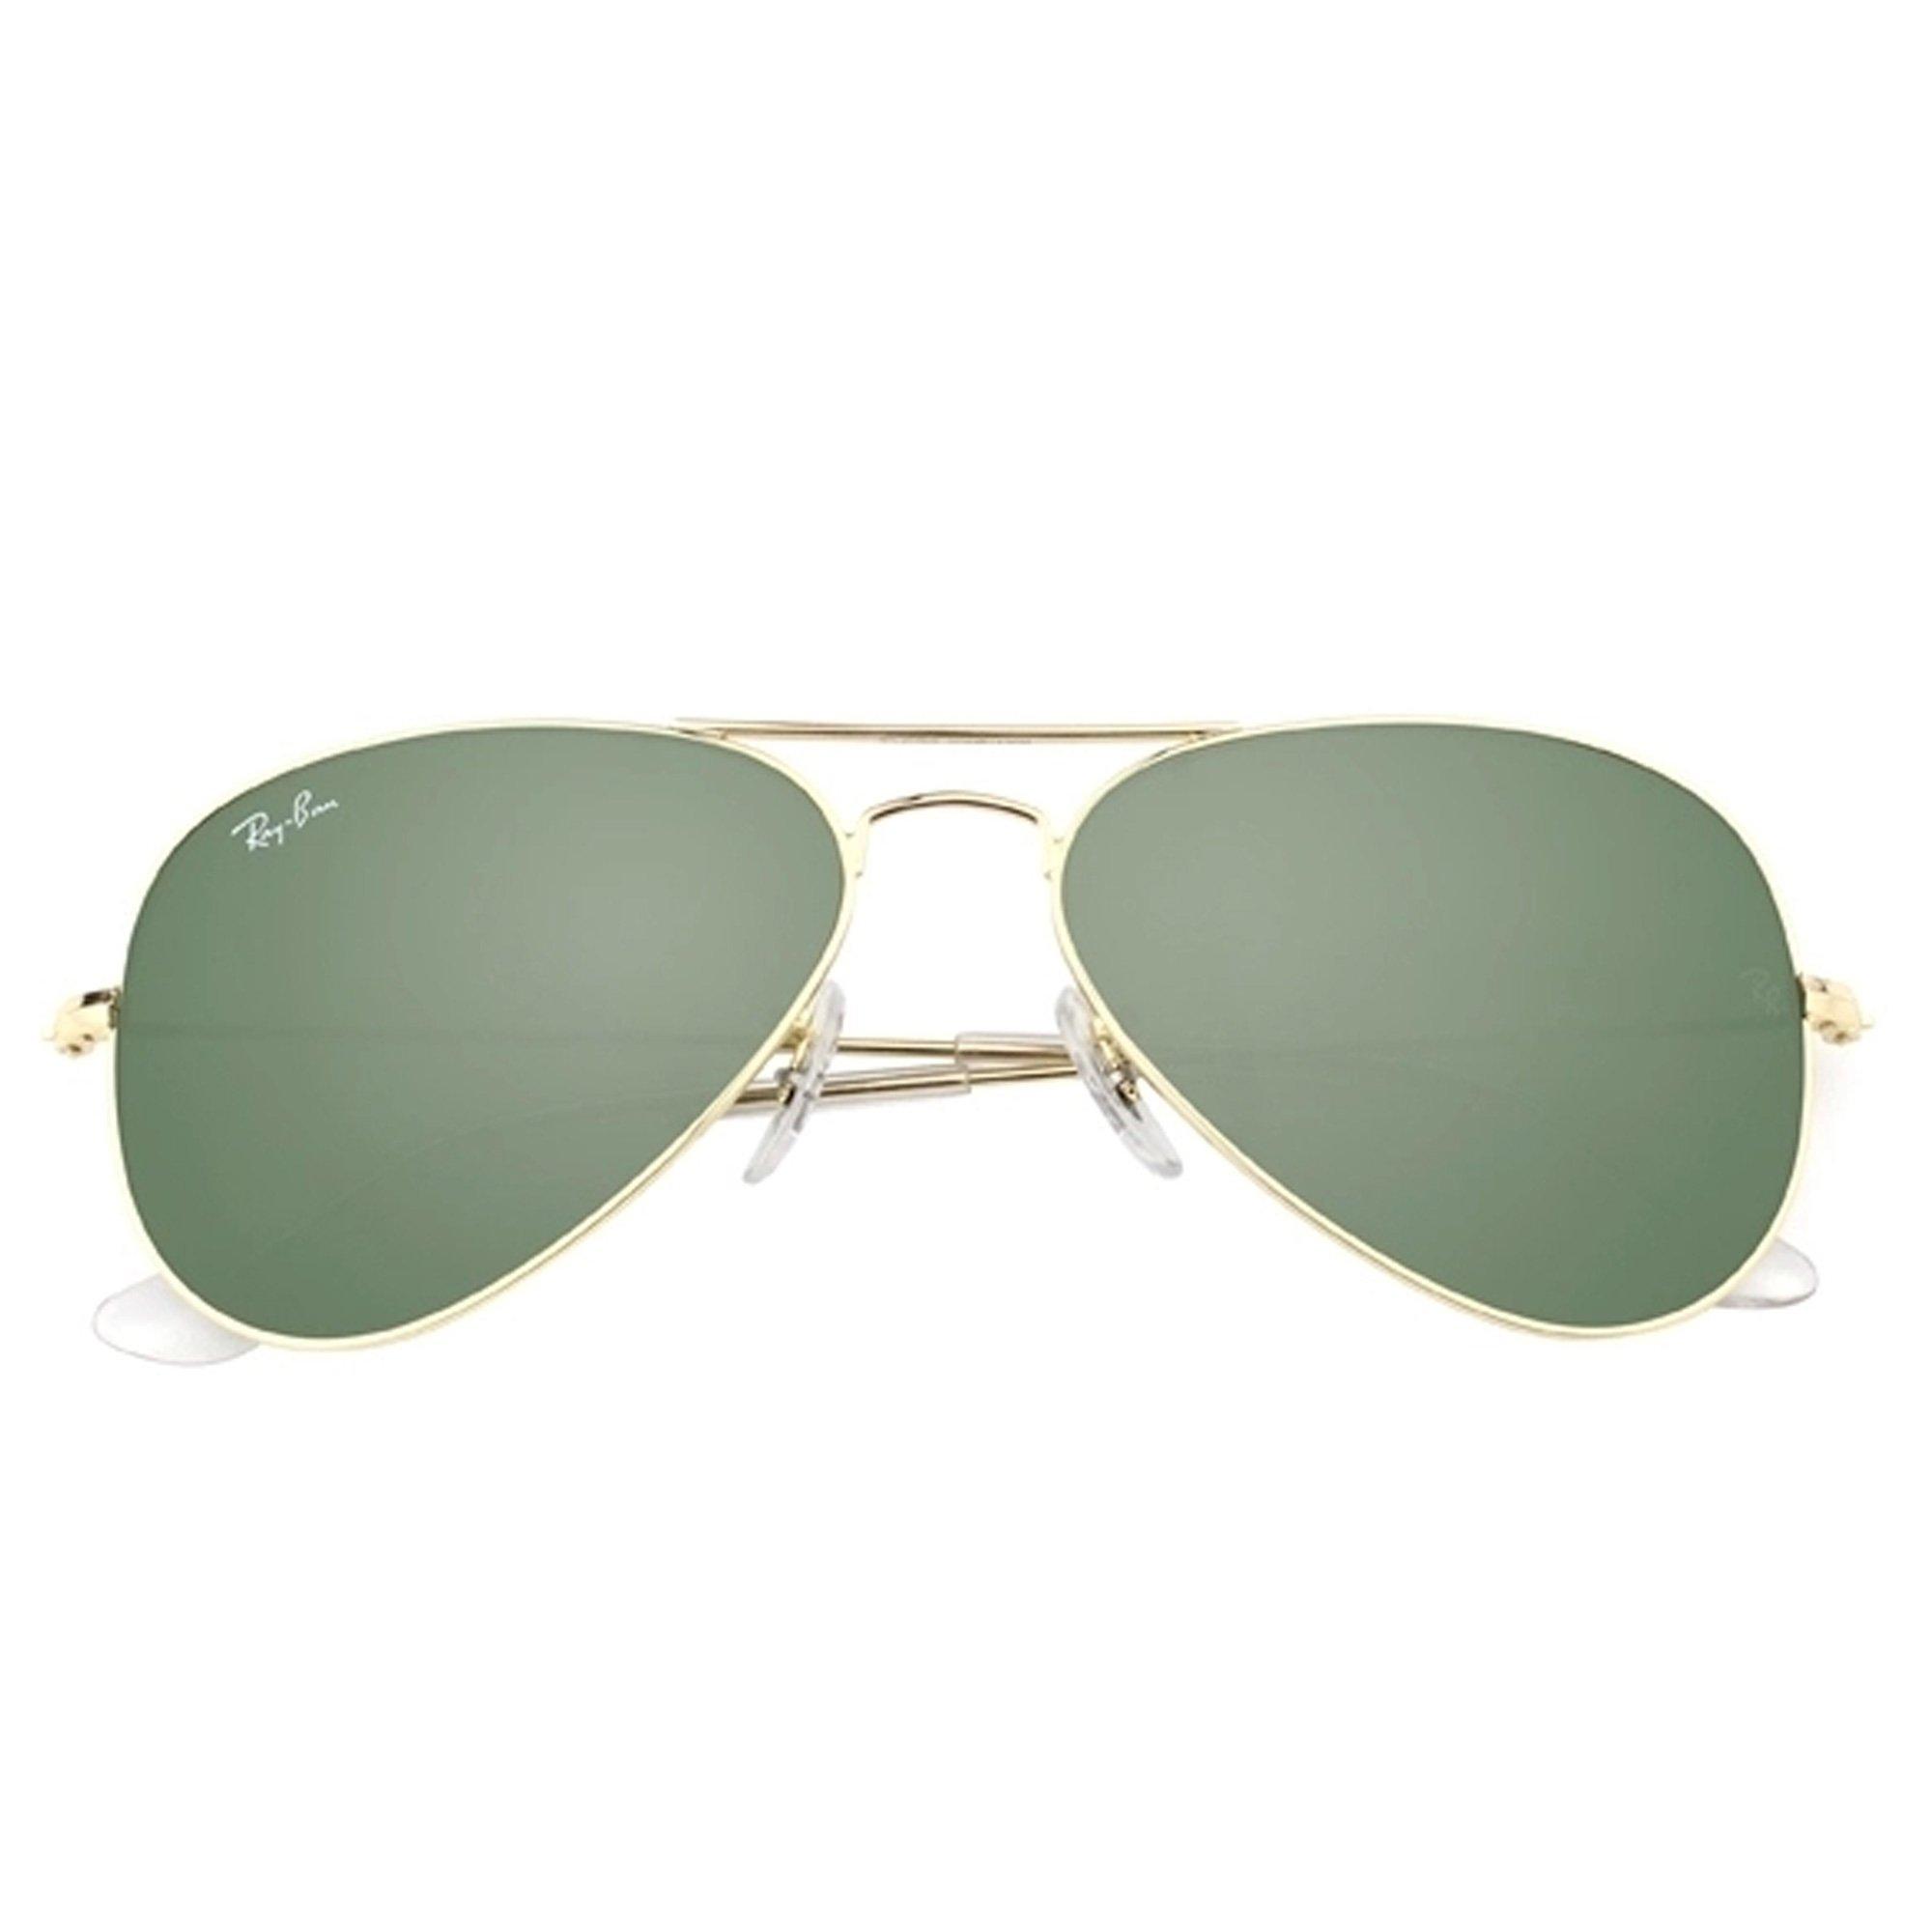 22588651dd Ray-Ban Men s Aviator 3025 Sunglasses Gold Frame Green G-15xlt Lens- 55mm -  RB3025-W3234   Fishing Apparel   Sports   Outdoors - tibs